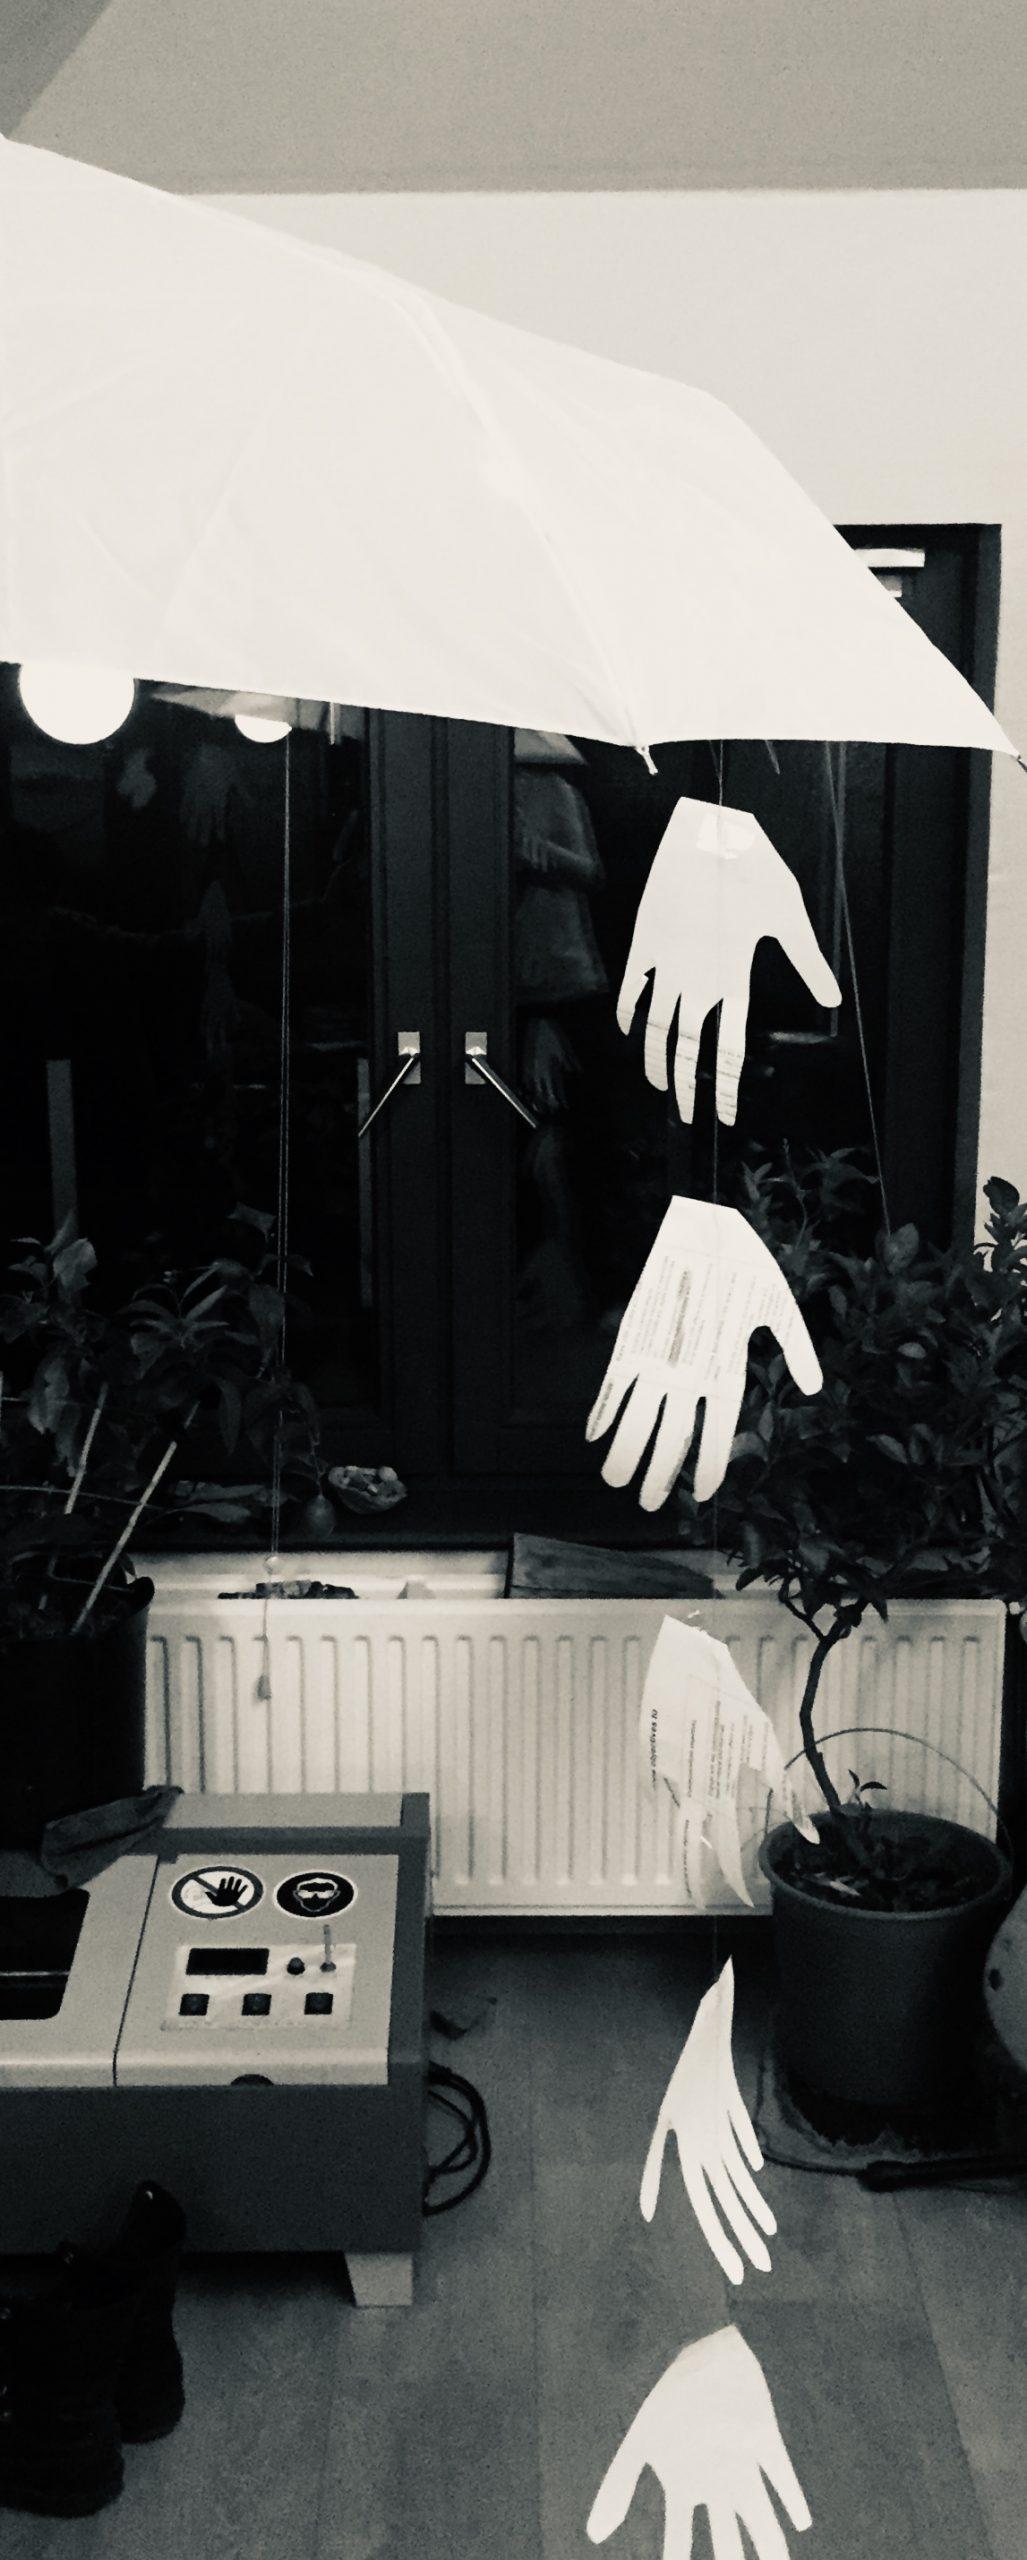 "Poem ""I Let My Hands Rain"", Modern Literature (India)"